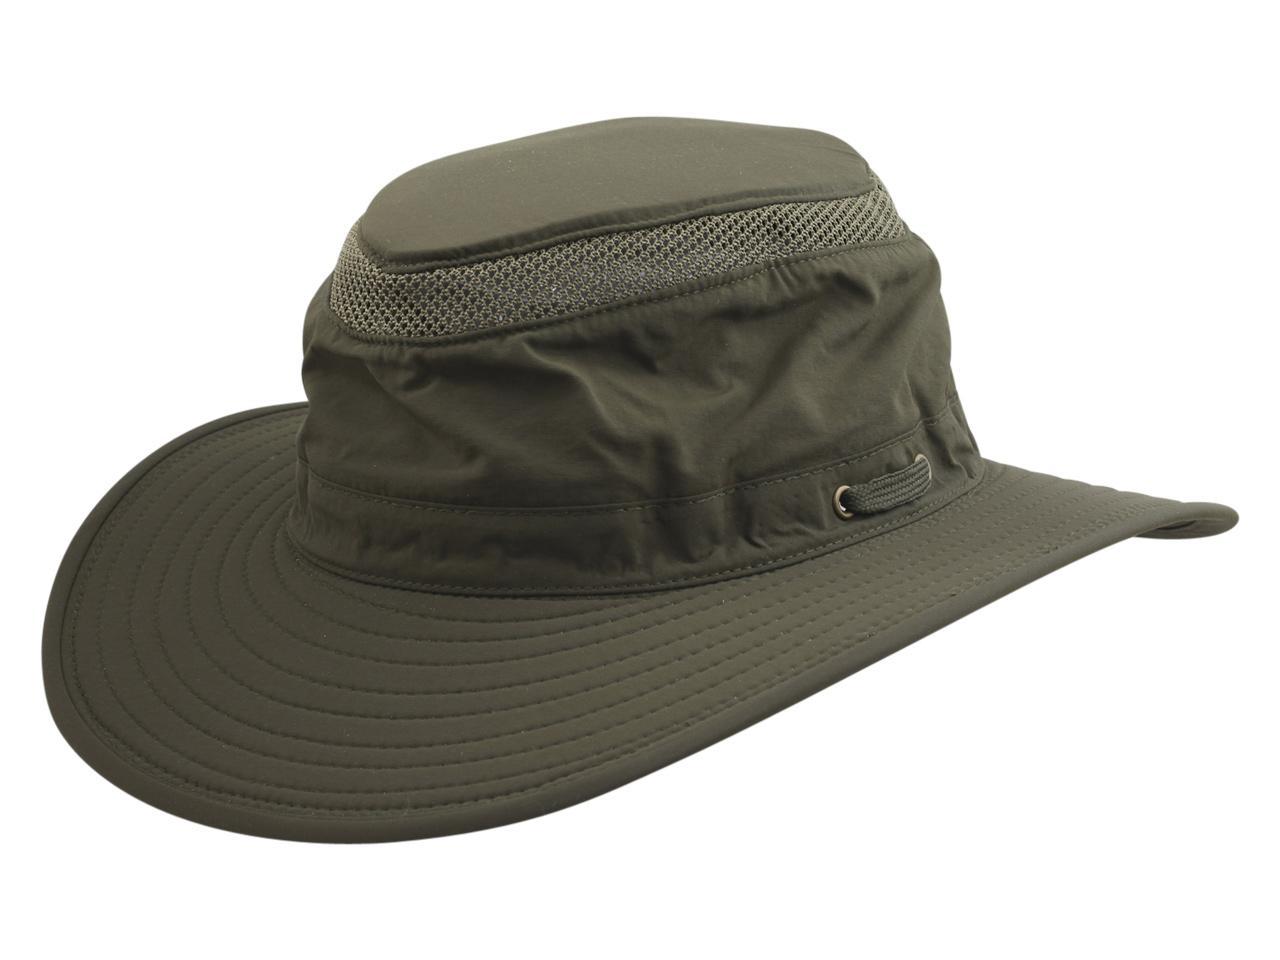 Image of Henschel Men's 10 Point Booney Hat - Olive - X Large